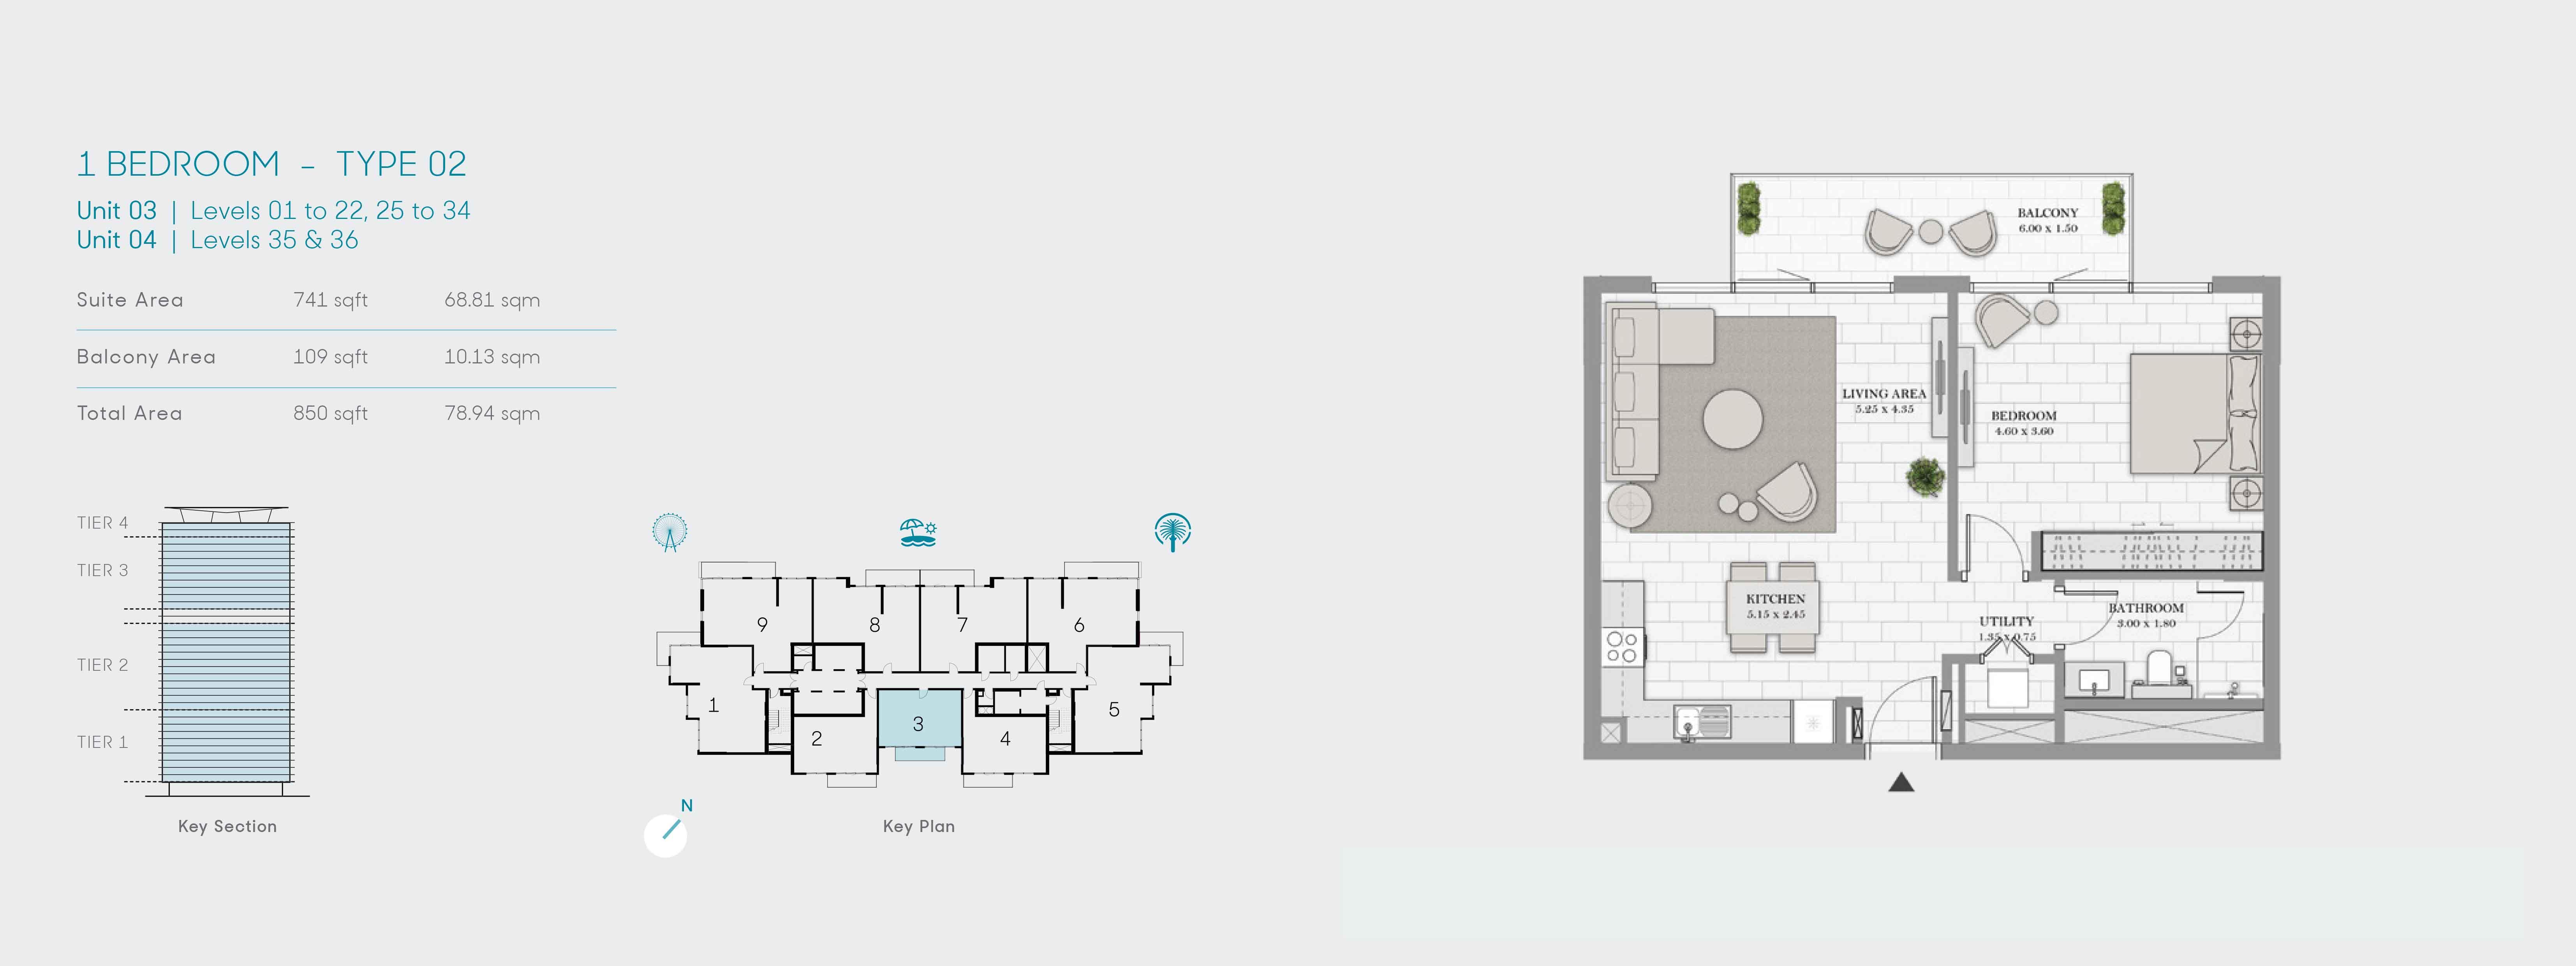 1 Bedroom-Type 02, Size 850 Sq Ft